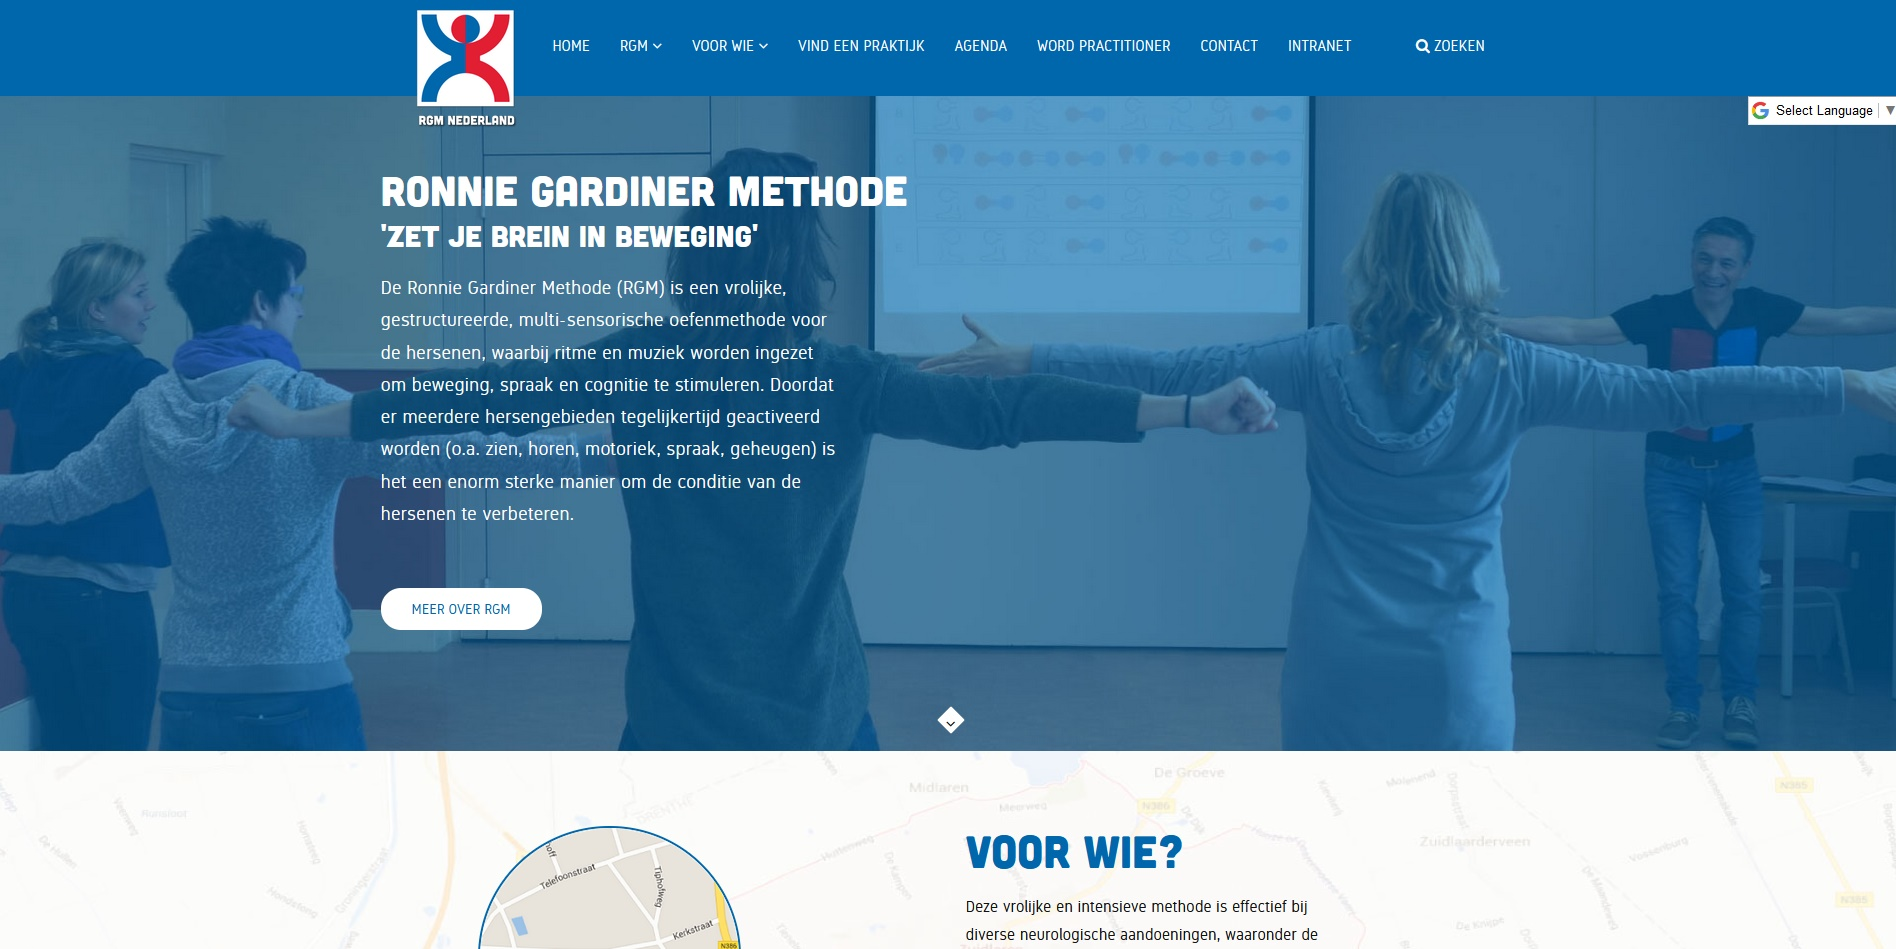 RGM Nederland